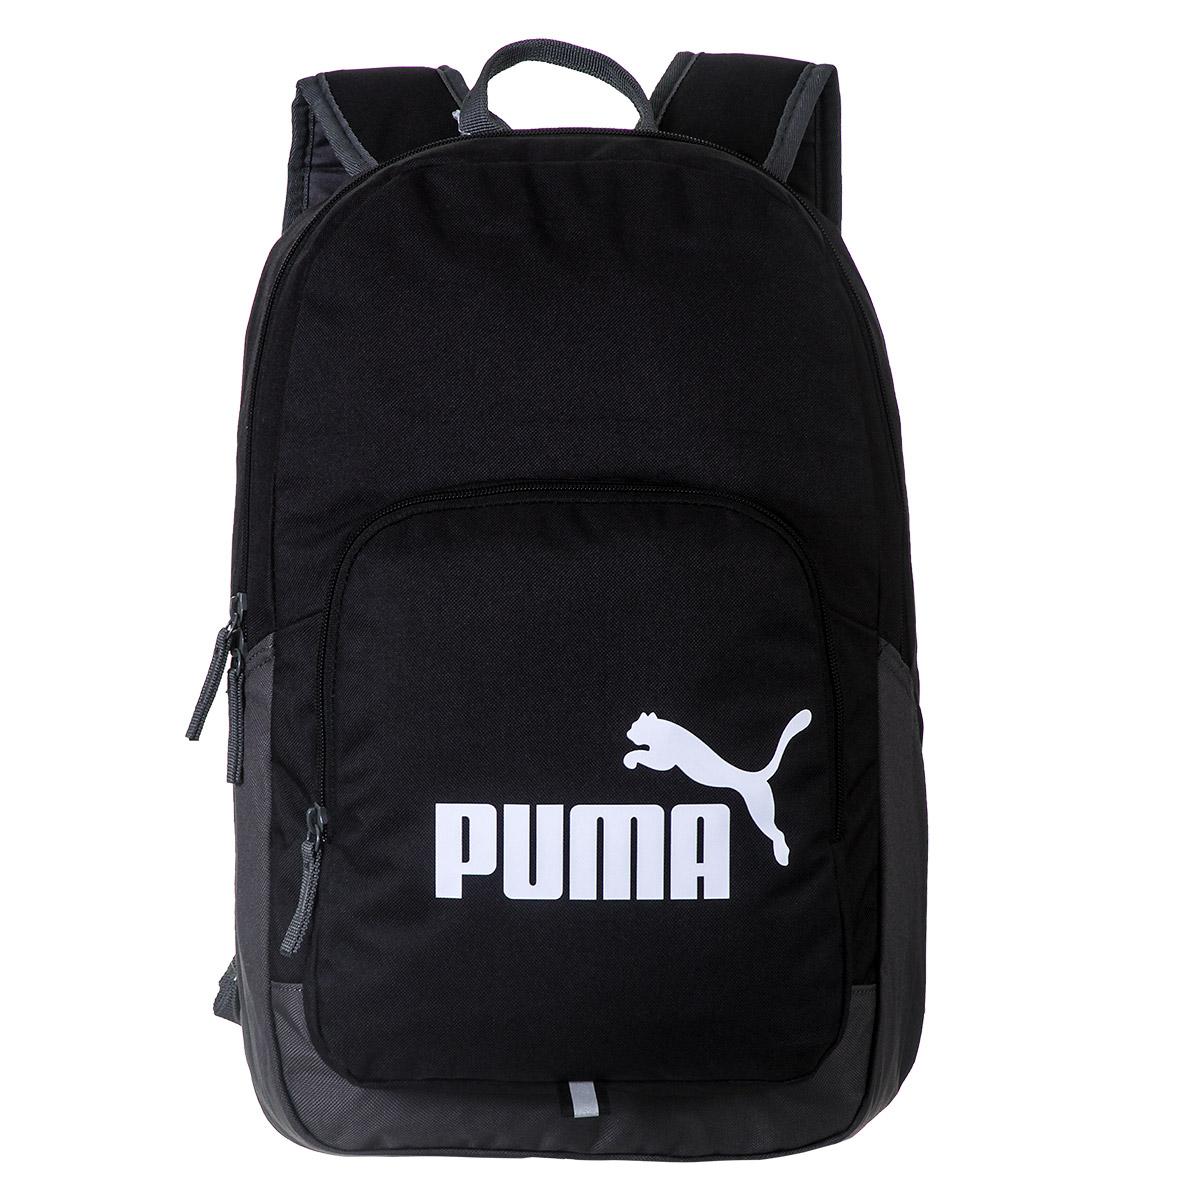 Mochila Puma Phase Unissex - Preto